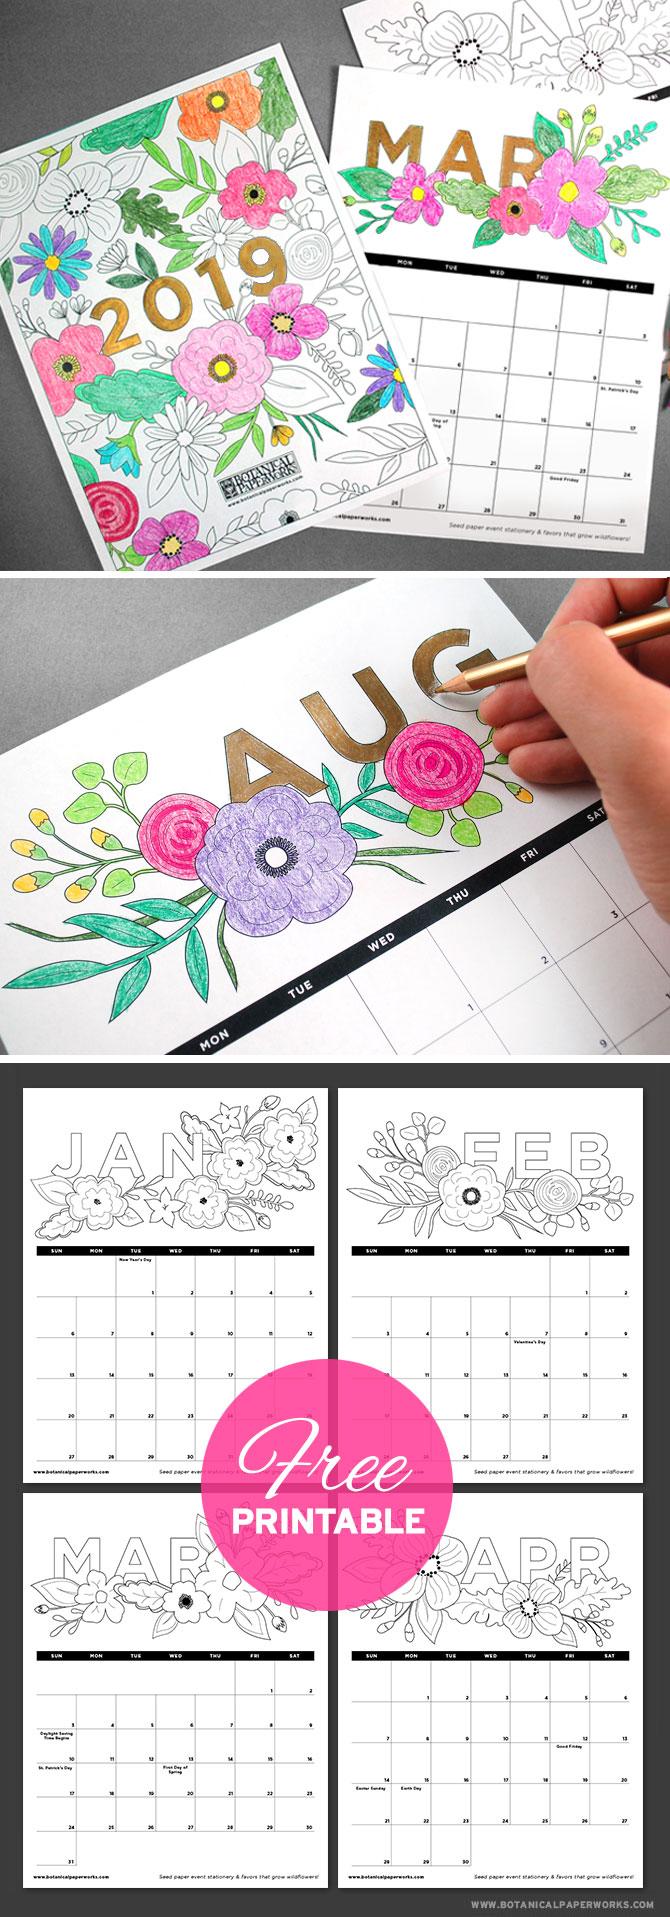 Free-Printable-Calendar-2019-Coloring.Page